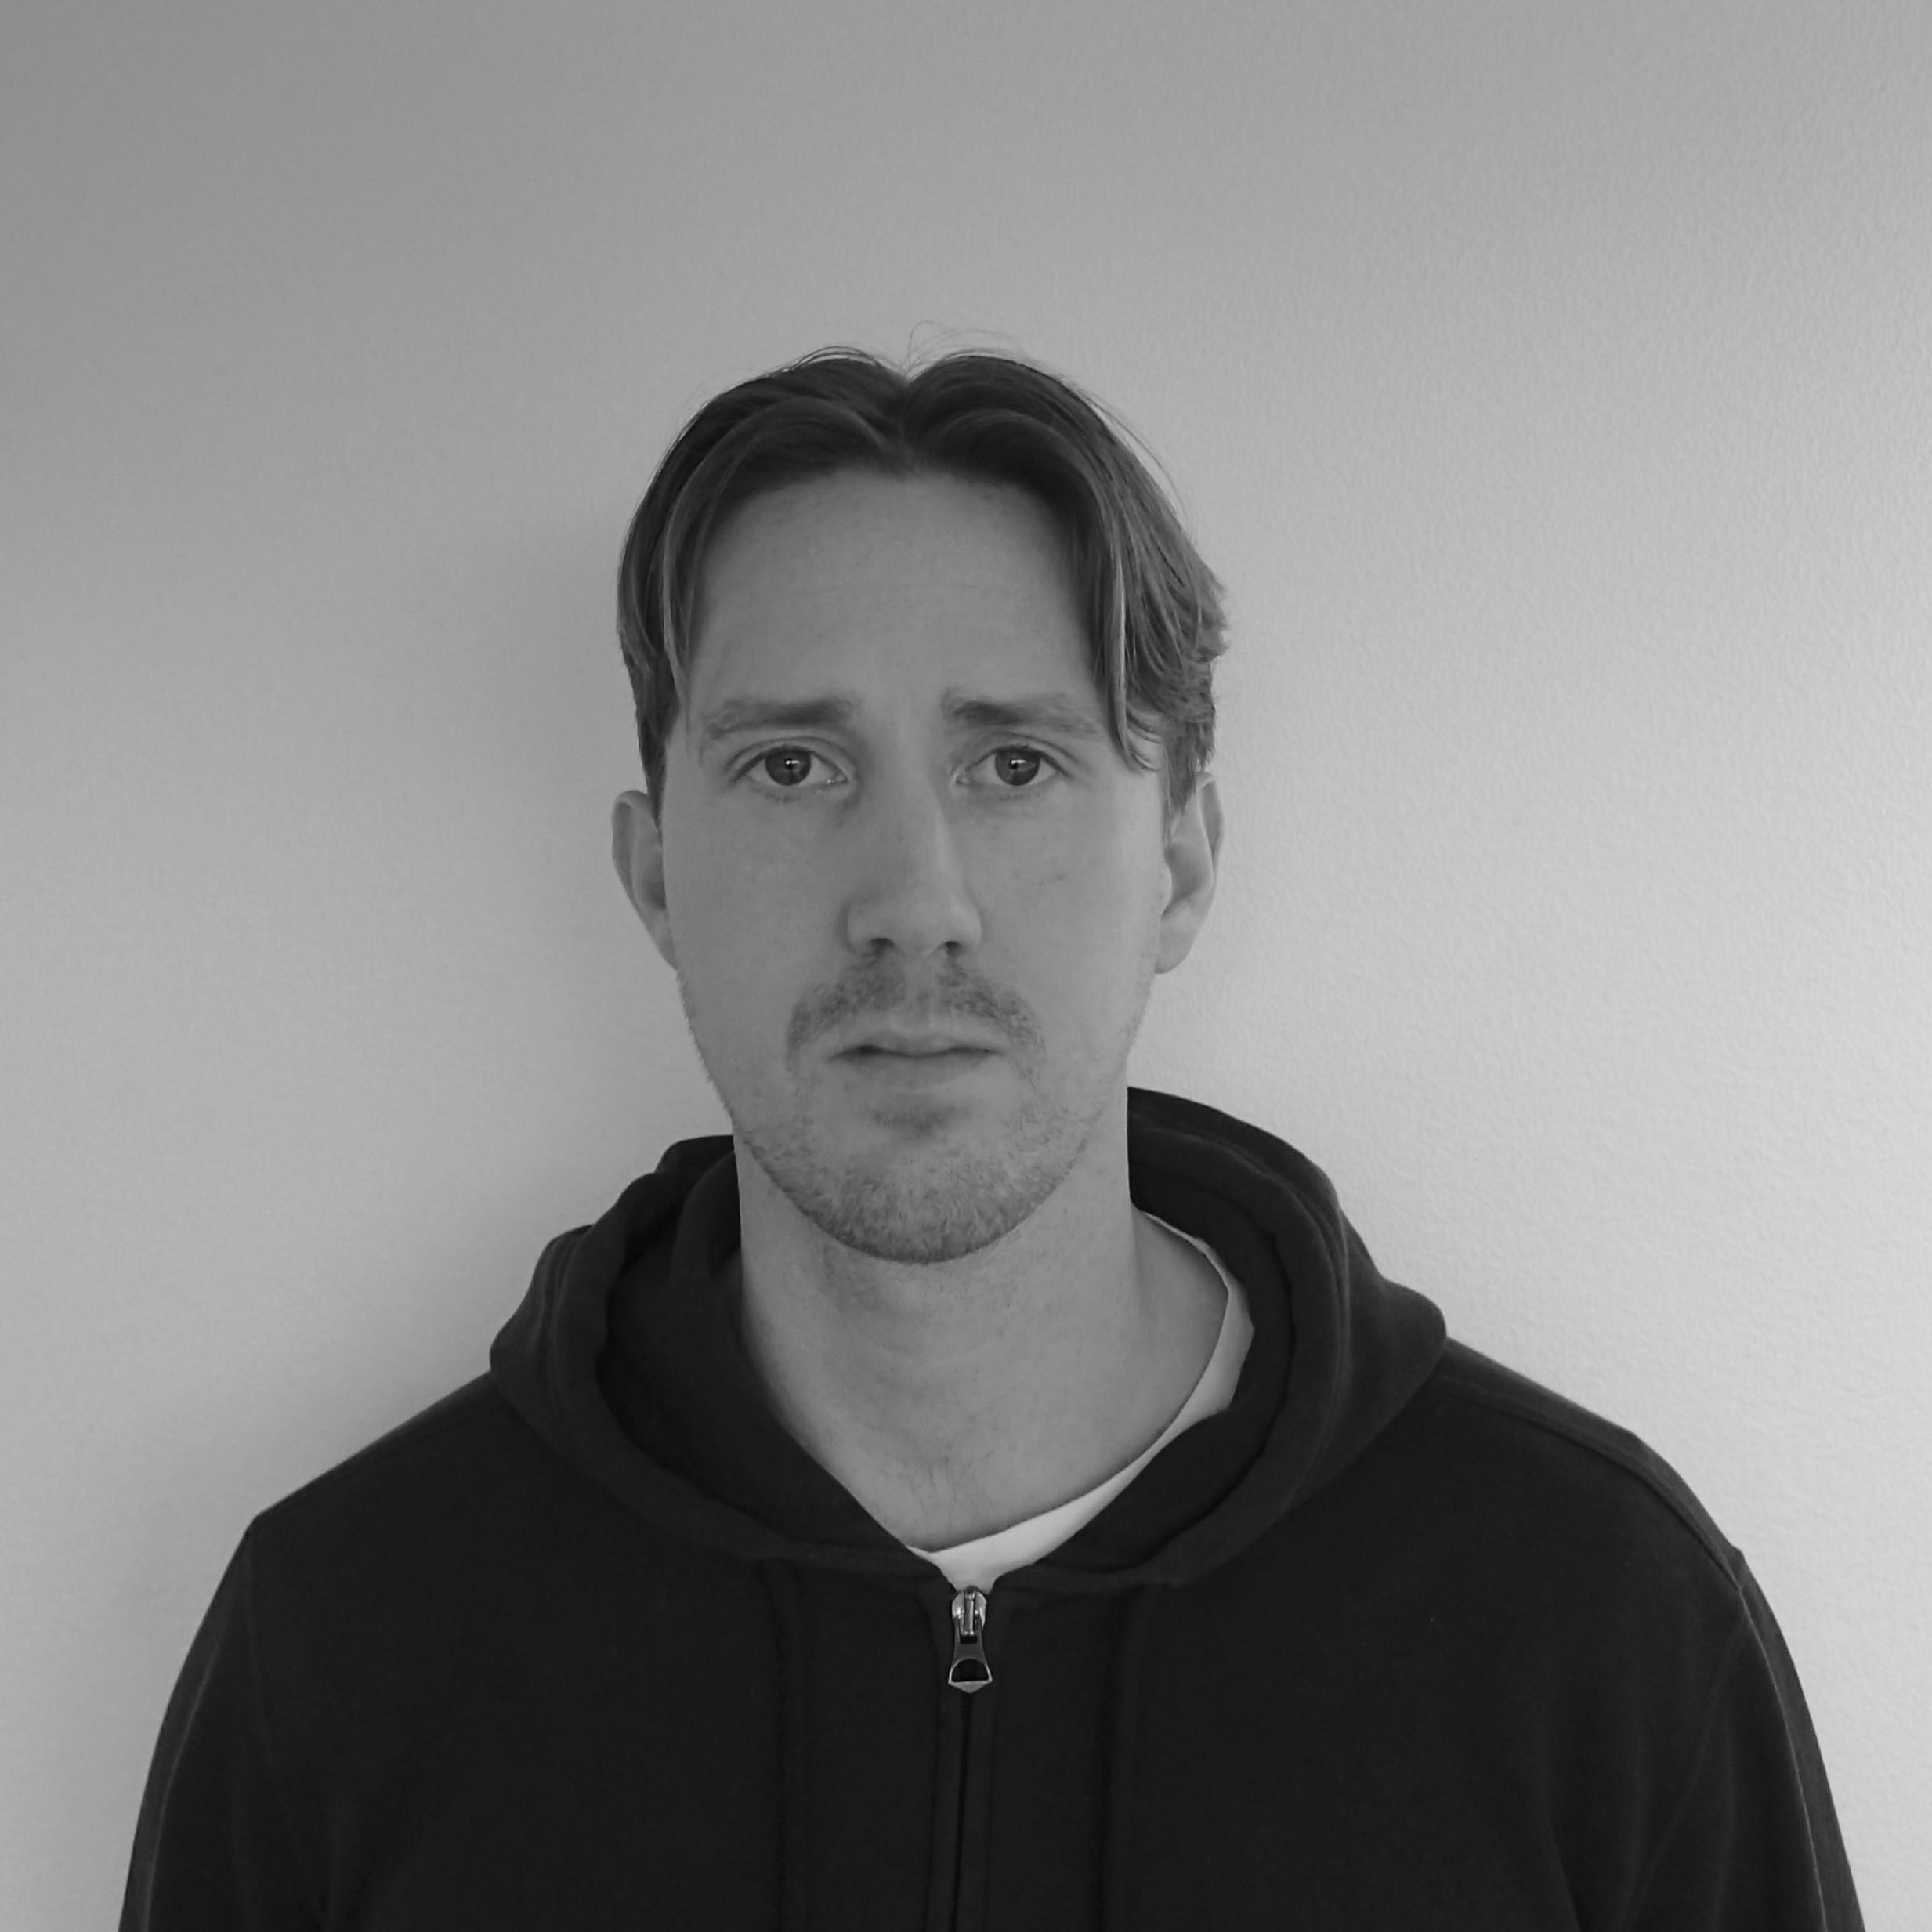 Viktor Birgersson